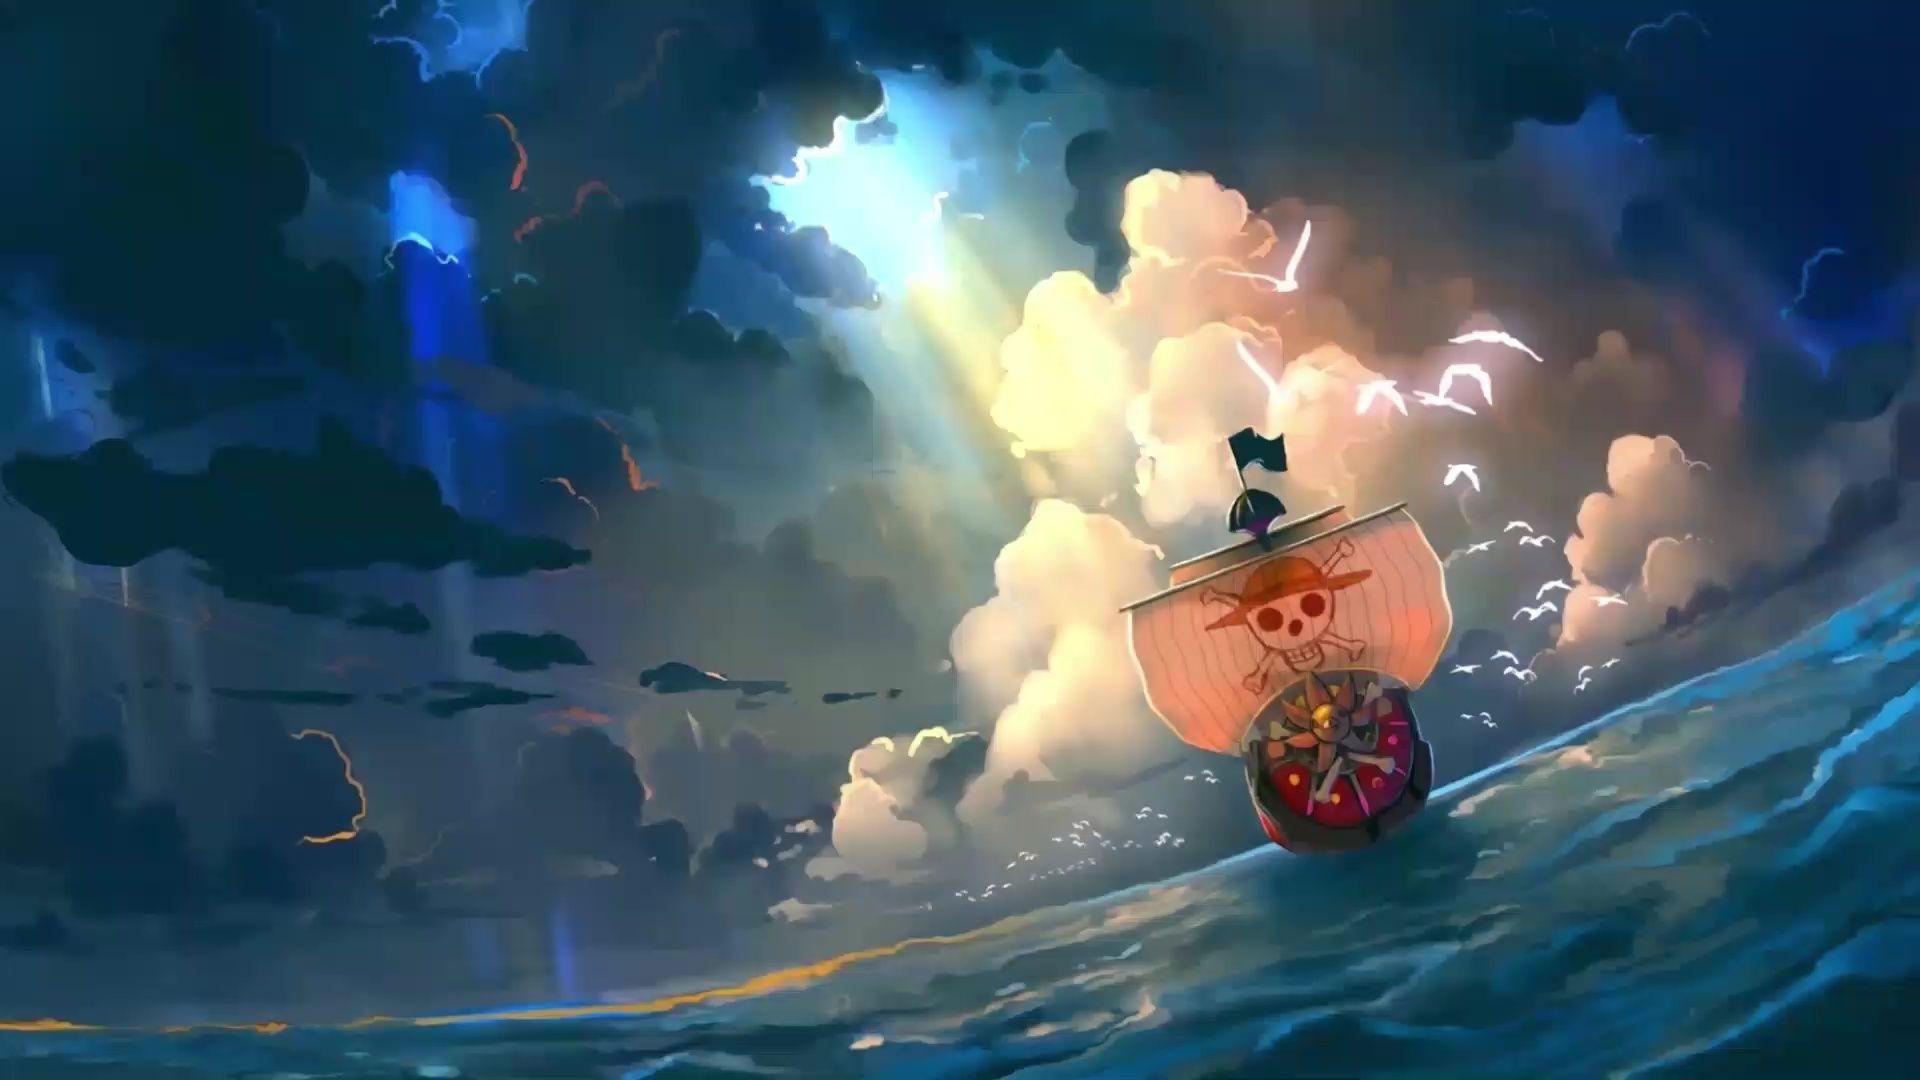 One Piece Ship Live Wallpaper Gambar Anime Gambar Animasi